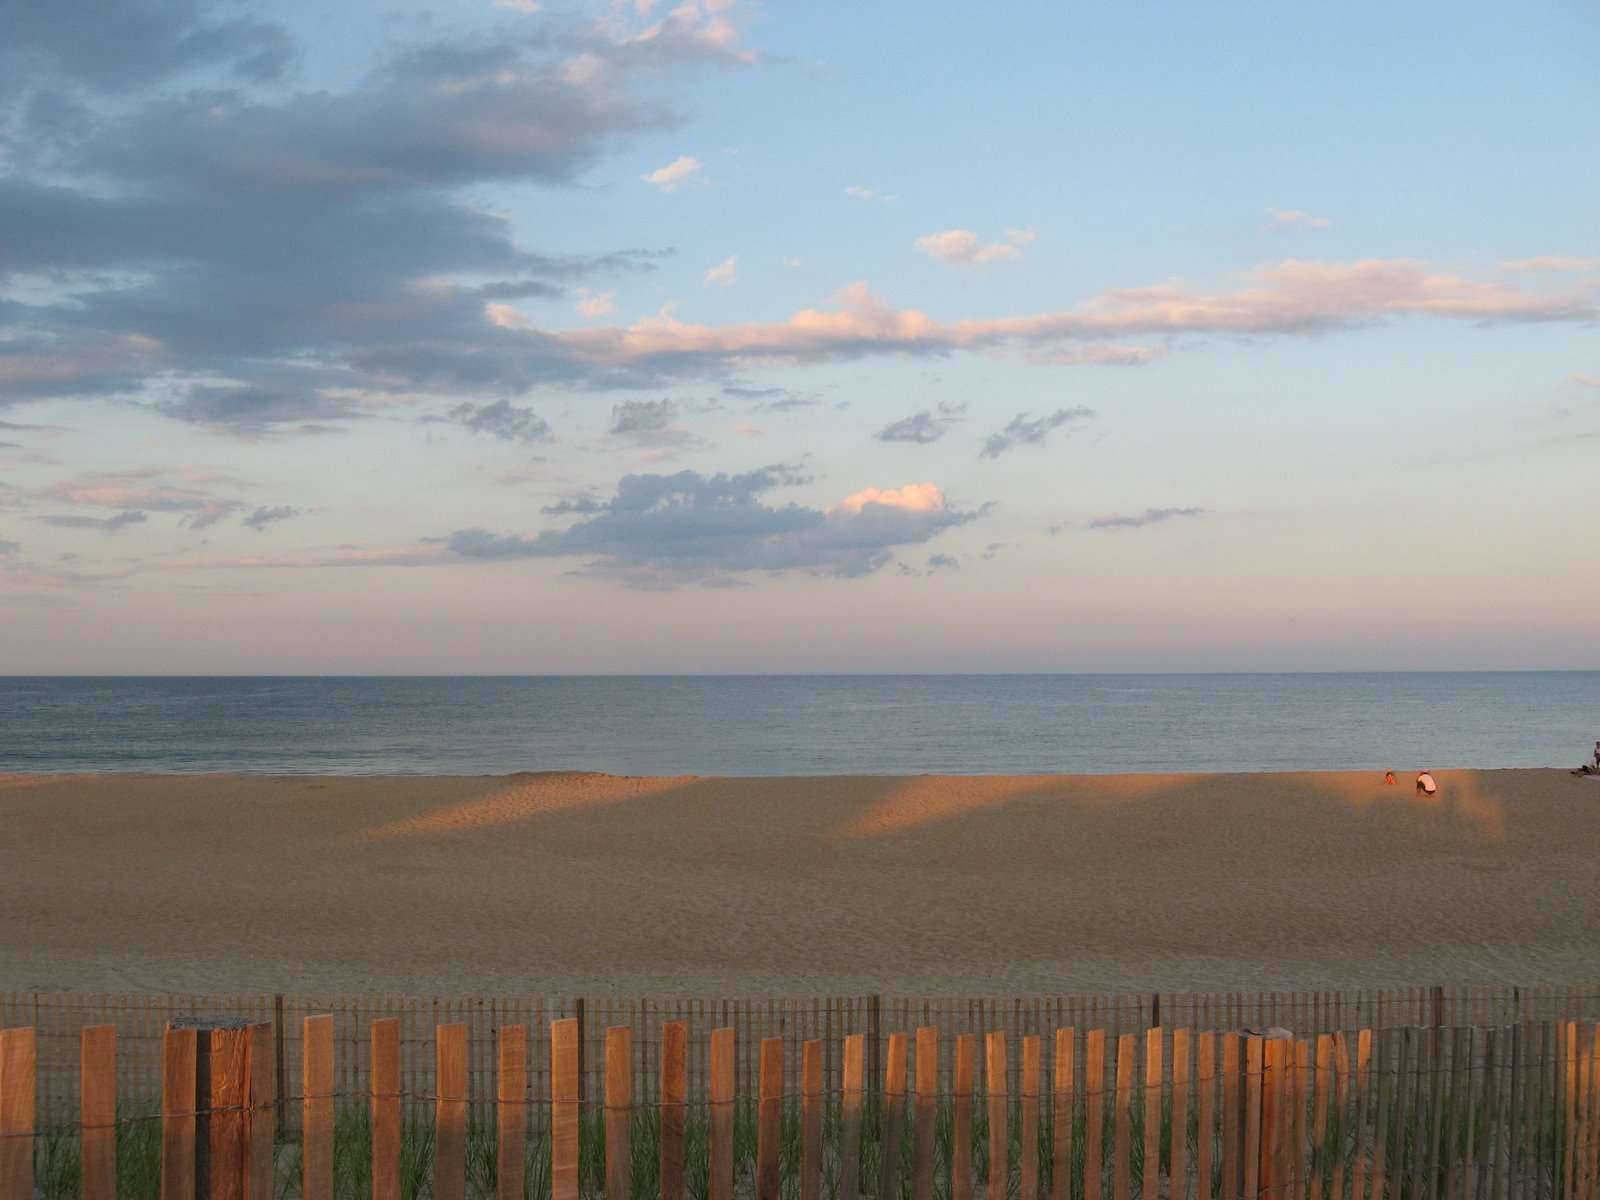 [Bethany+Beach+08+087.jpg]